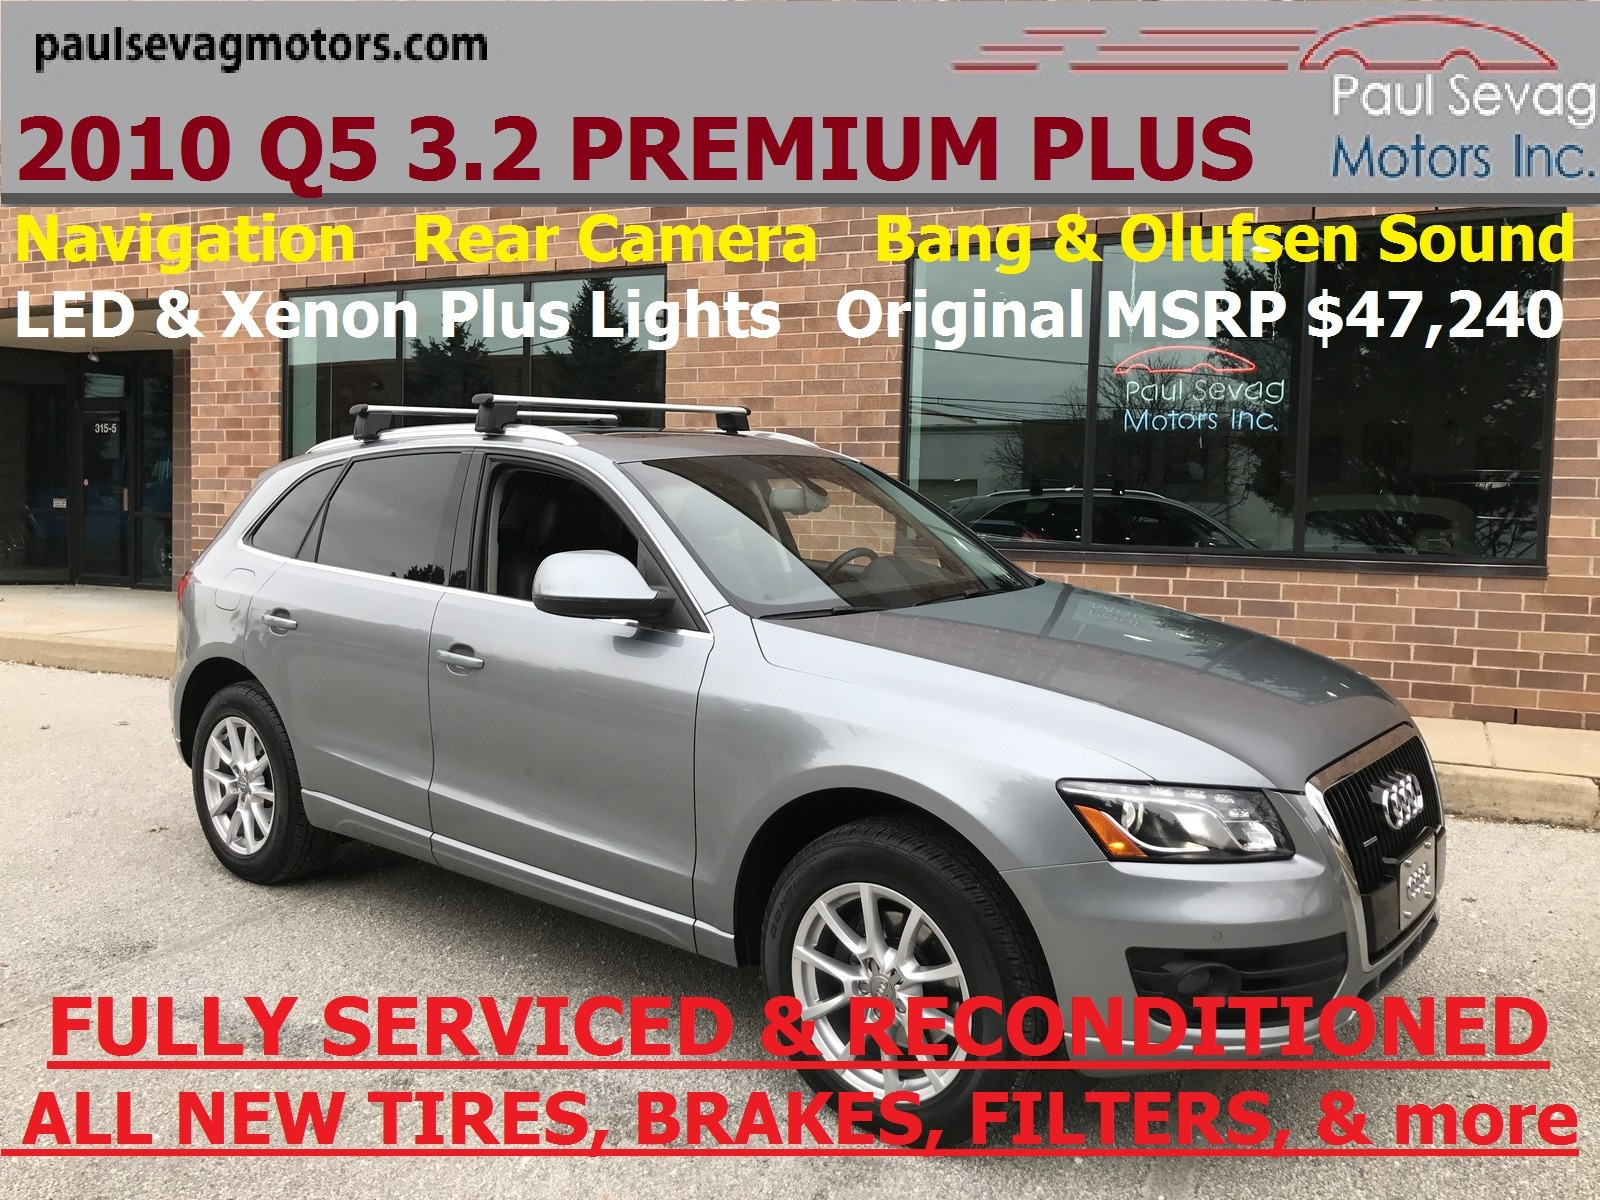 2010 Audi Q5 3.2 Quattro Premium Plus Navigation/Bang & Olufsen/MSRP $47,240 SUV